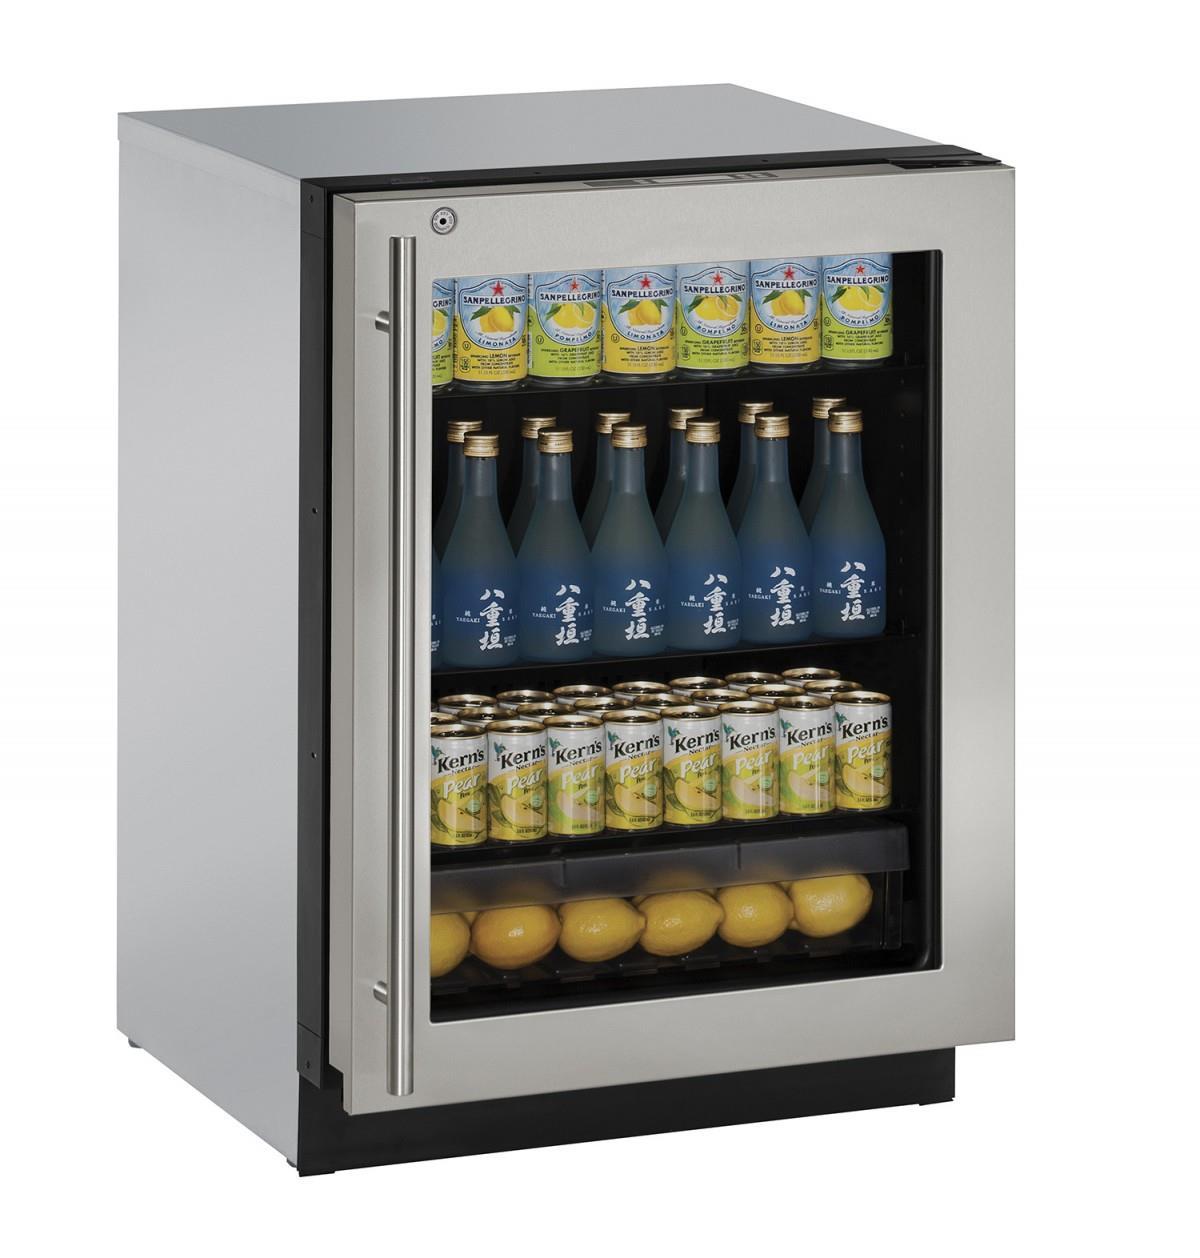 Merveilleux ... Glass Door Compact Refrigerator. U Line Refrigerators24 ...